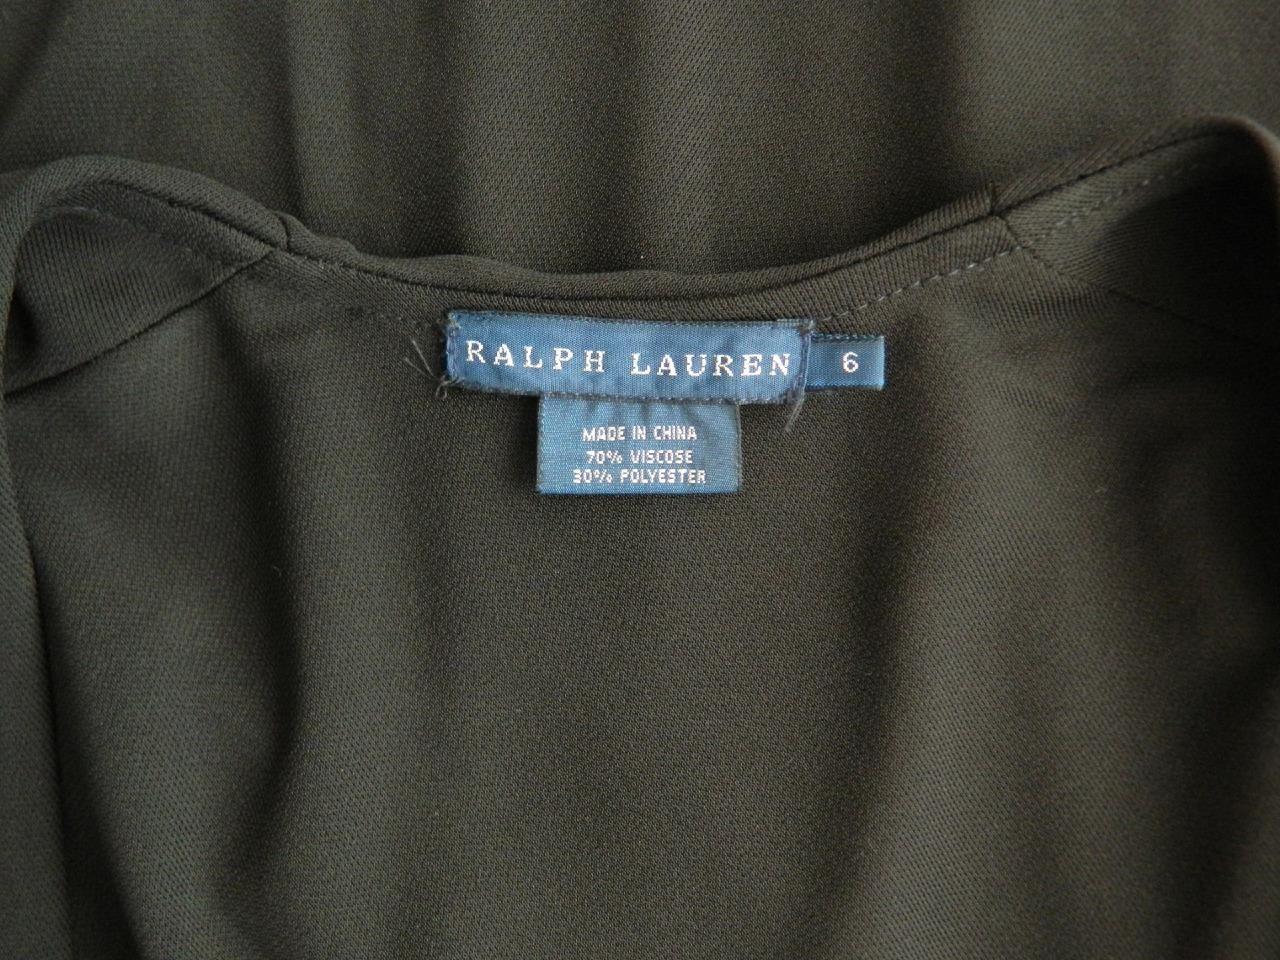 Ralph Lauren Dress Long Black Jersey Maxi Dress Side Slits Sleeveless V-Neck 6